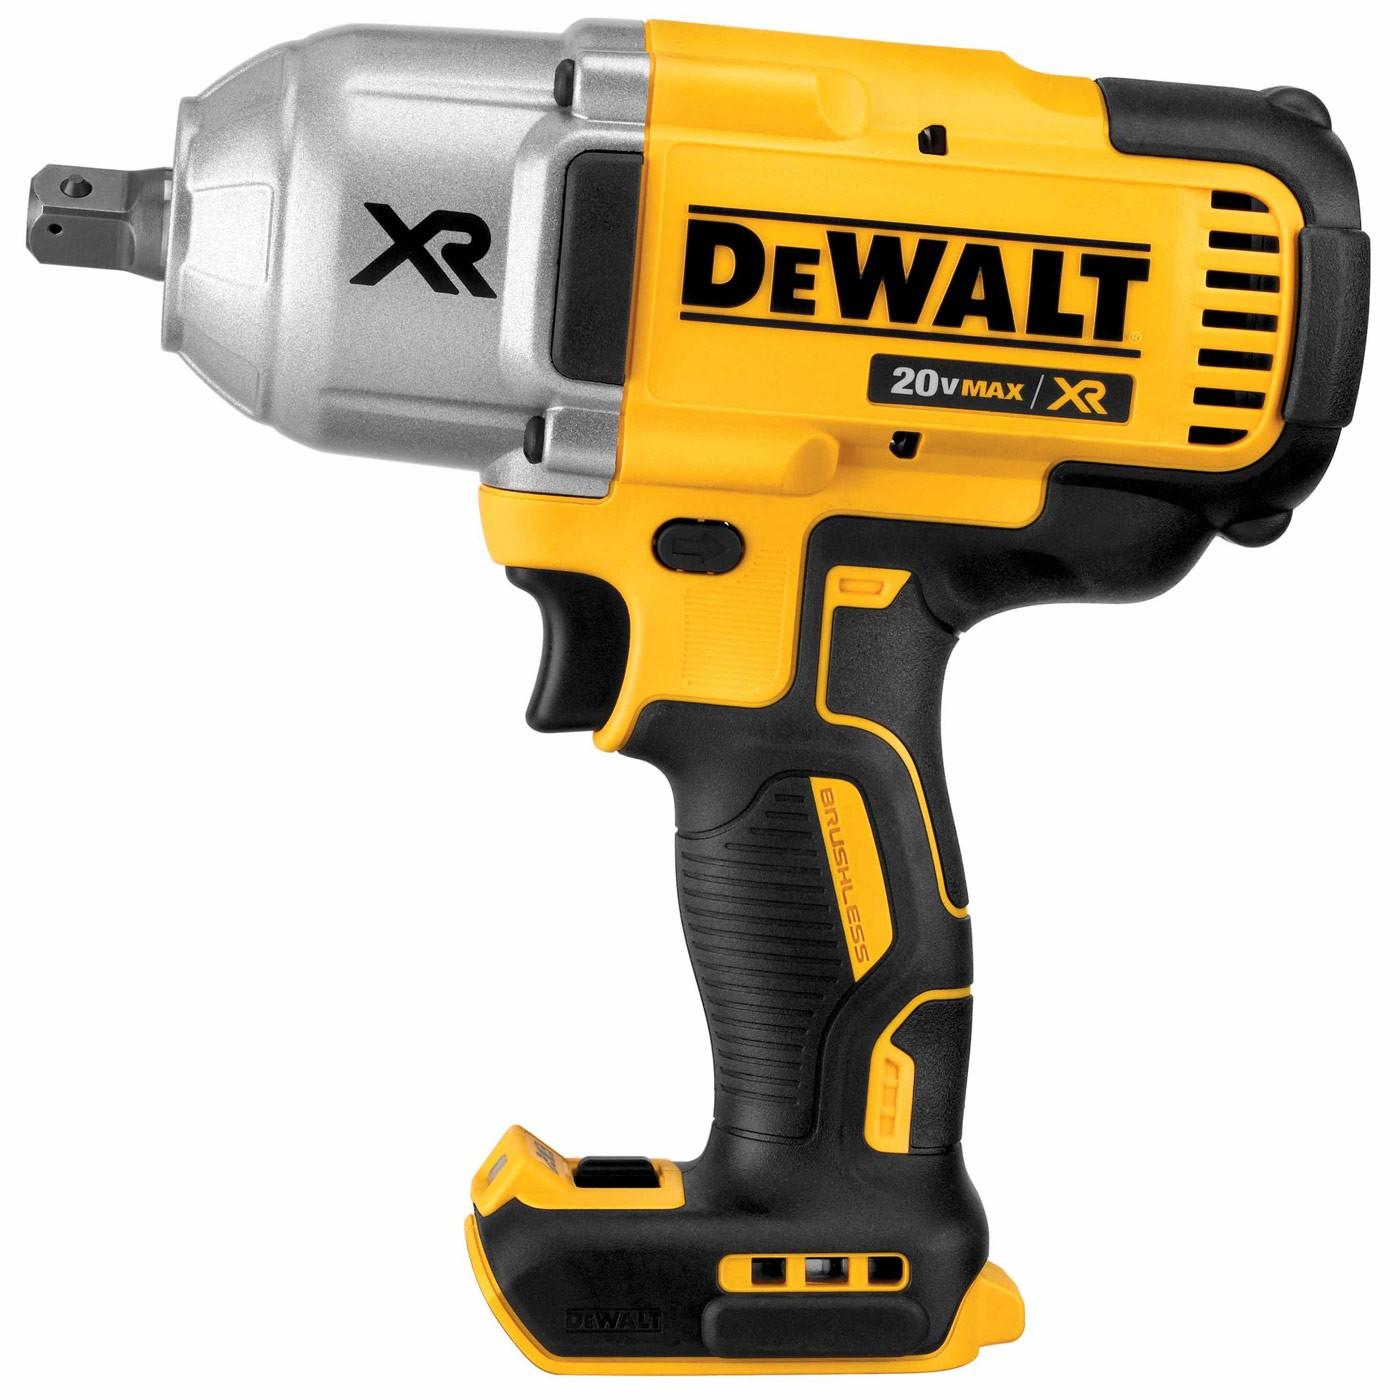 Details About Dewalt Dcf899b 20v Max Xr Brushless 1 2 Impact Wrench Detent Bare